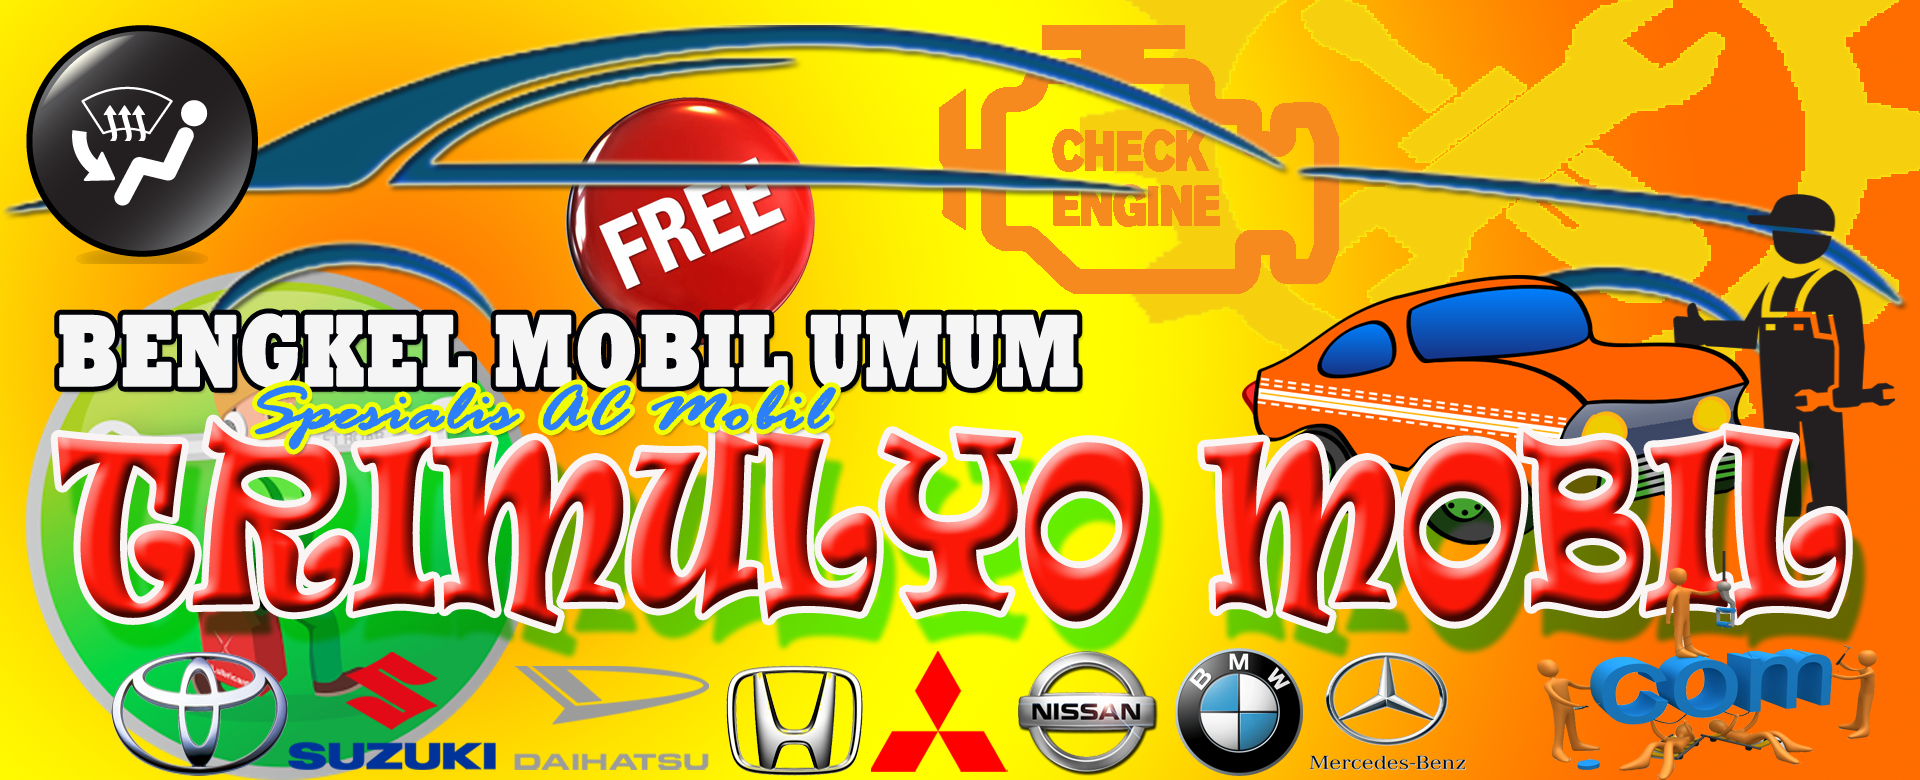 Bengkel AC Mobil segala merk di wilayah Bantul Yogyakarta dengan harga murah dan bersahabat